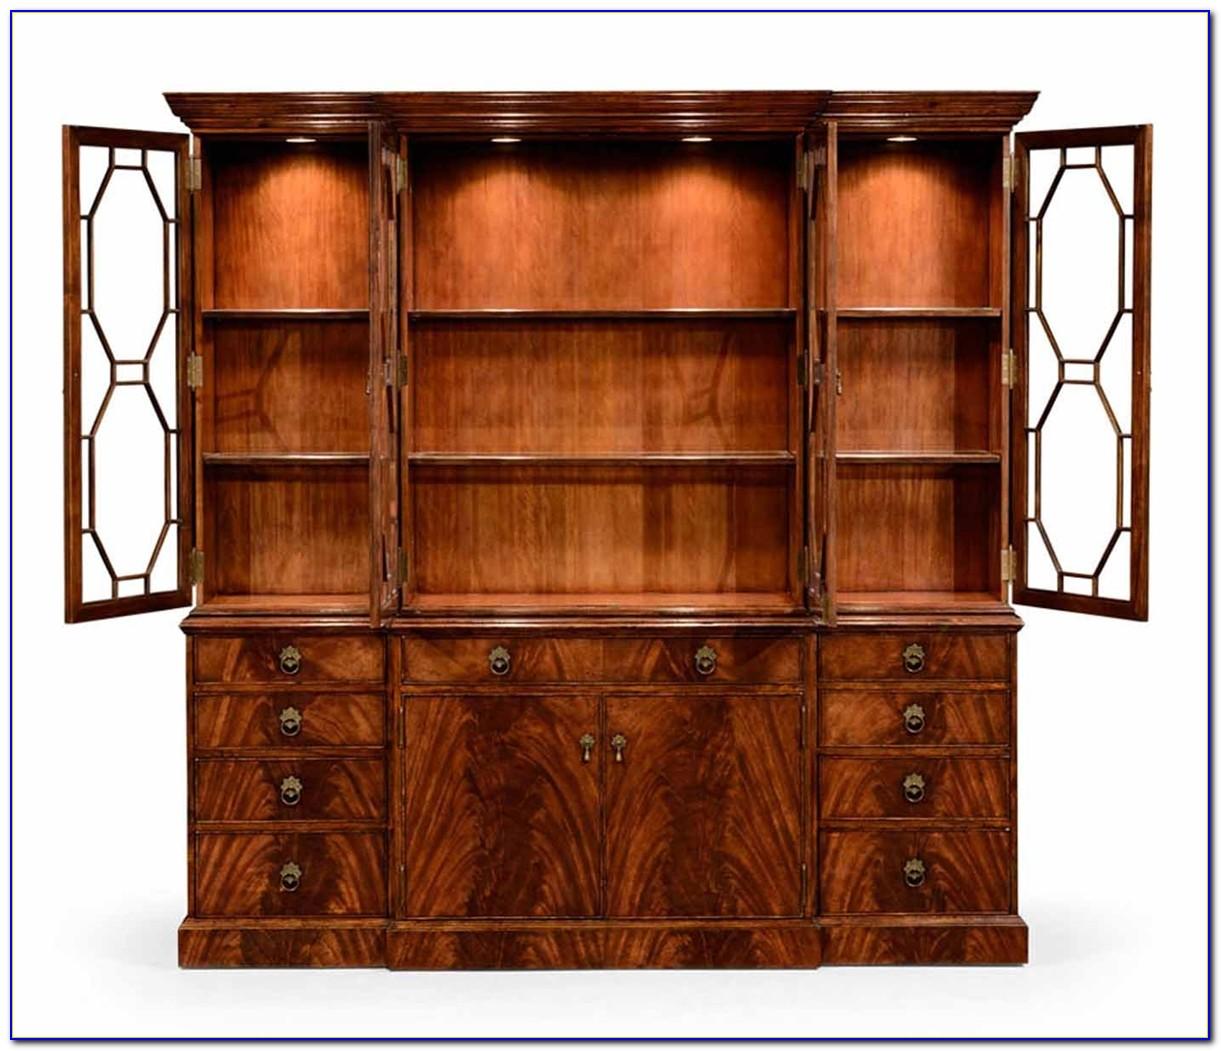 Mahogany Bookcase With Glass Doors